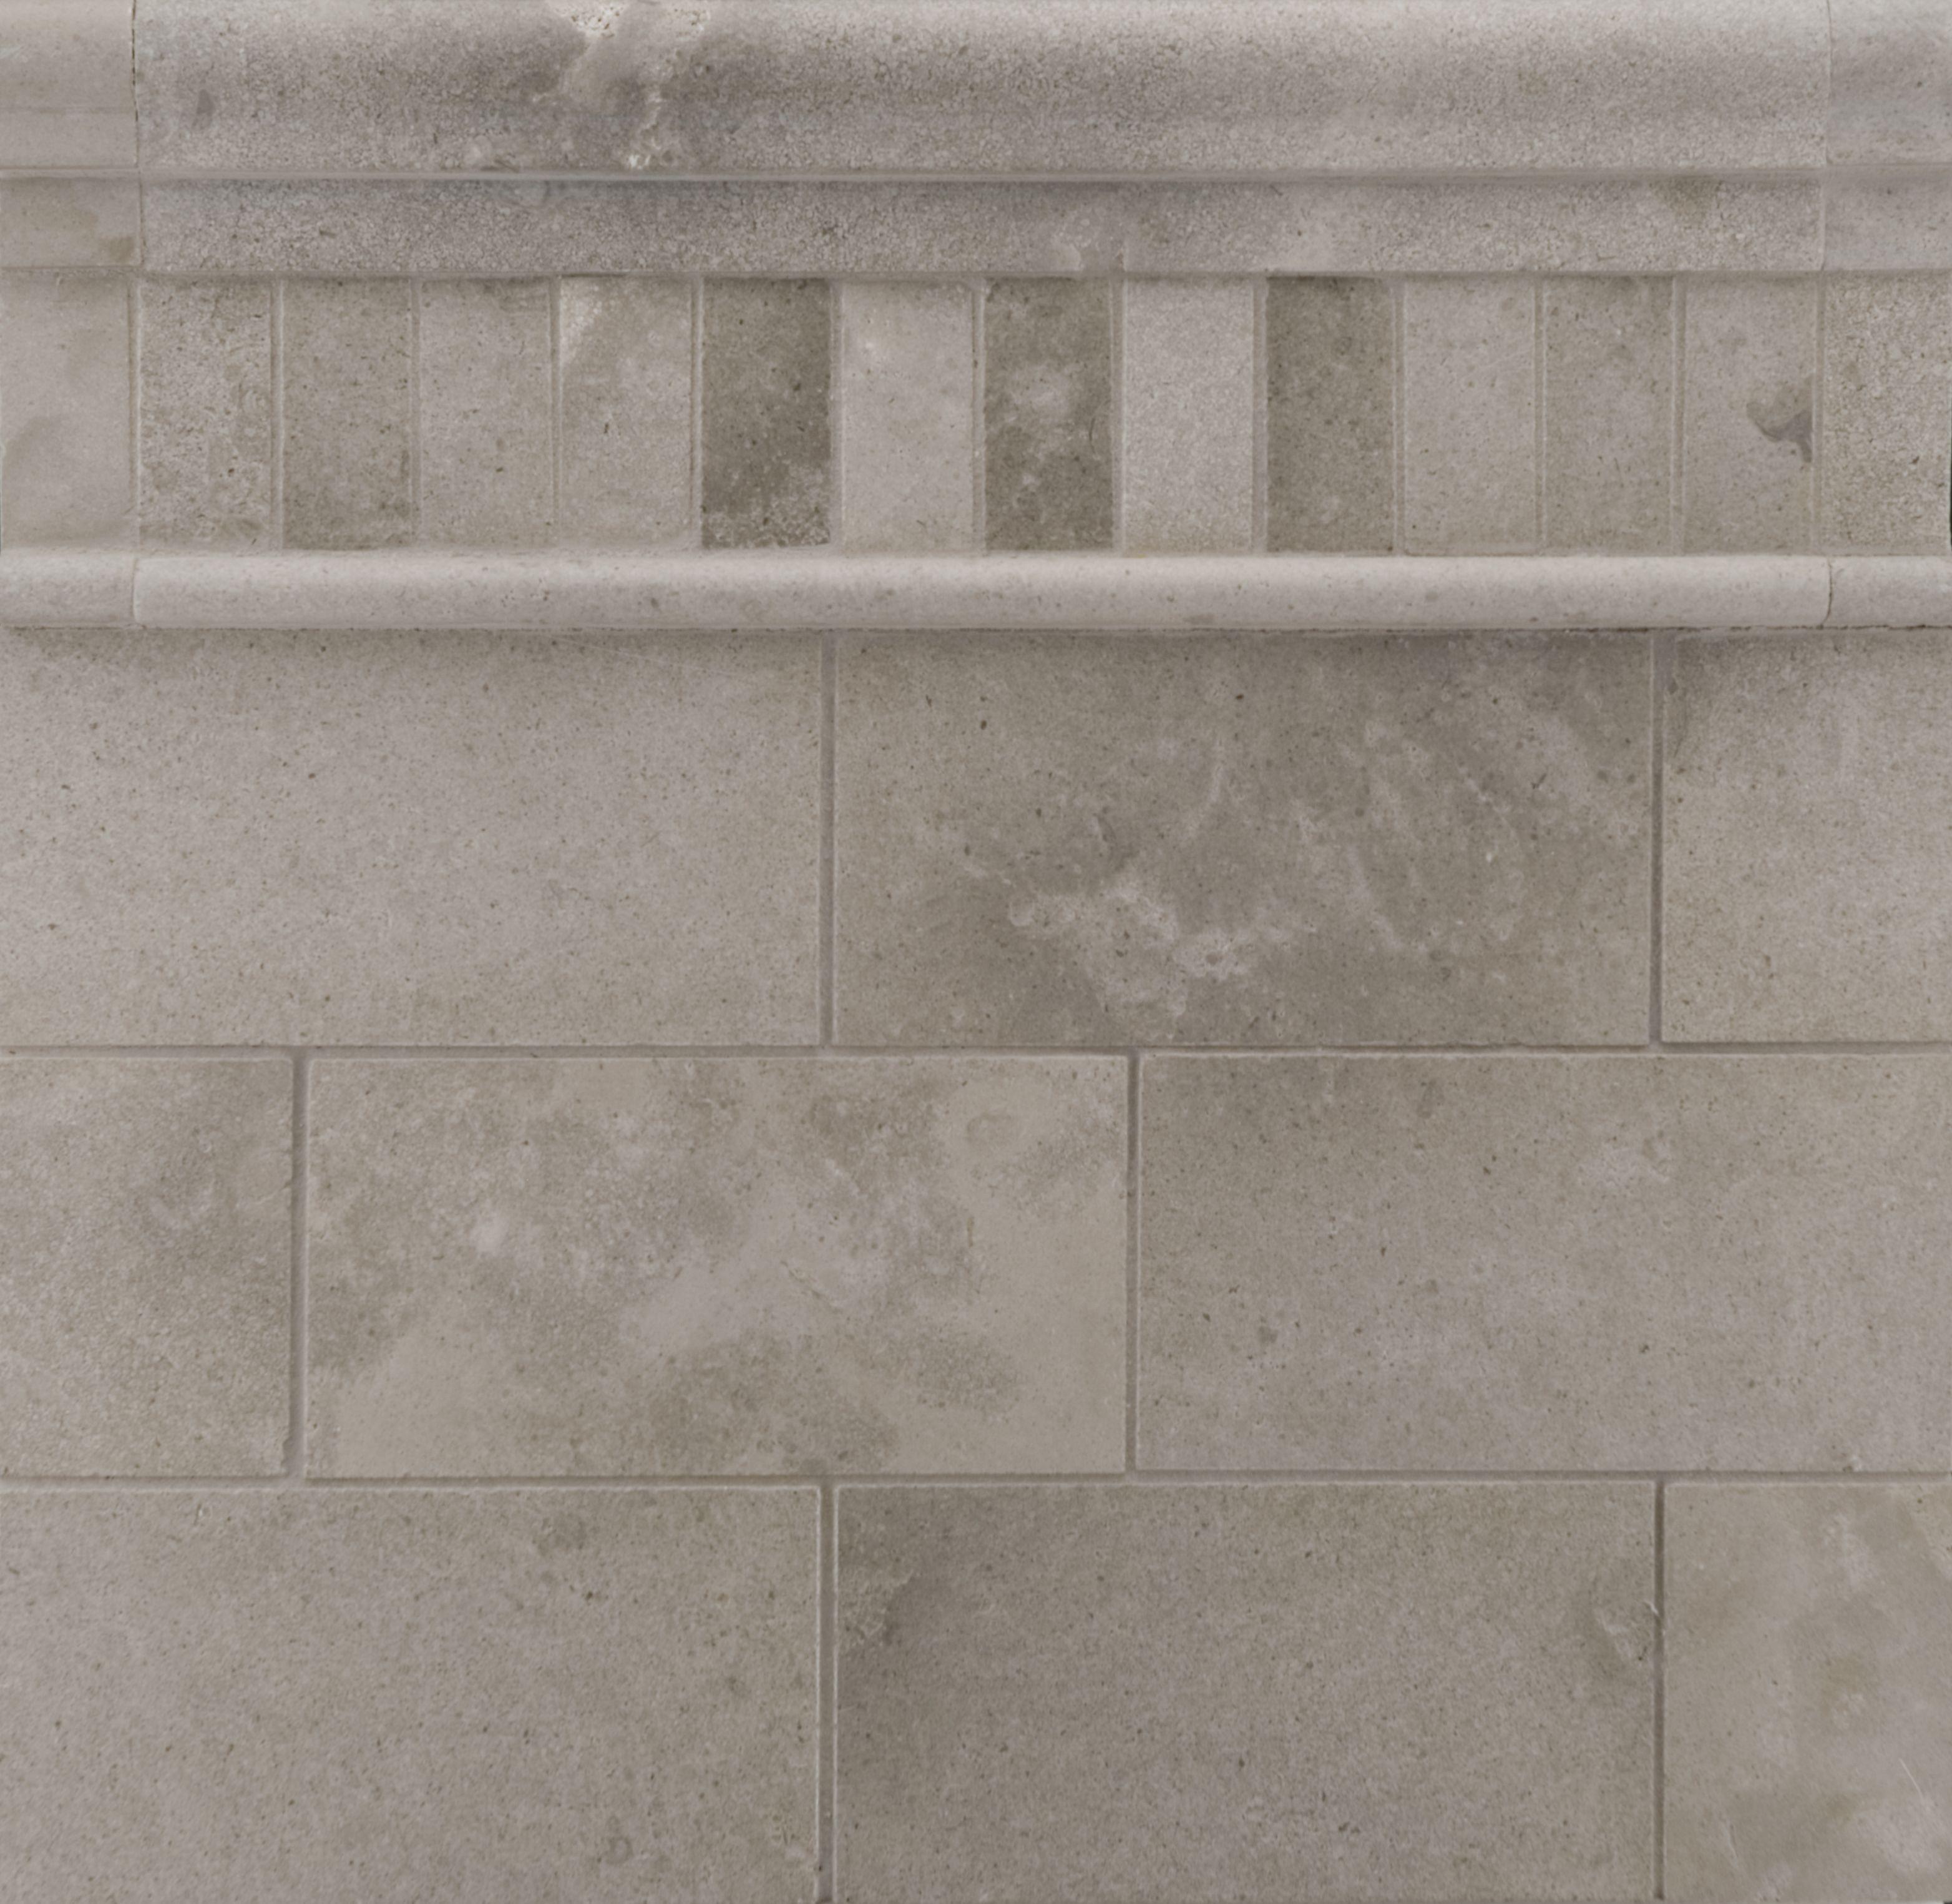 "Ann Sacks Mosaic Bathroom Tile: ANN SACKS Pewter 3"" X 6"" Limestone Field, 1"" X 2"" Offset"